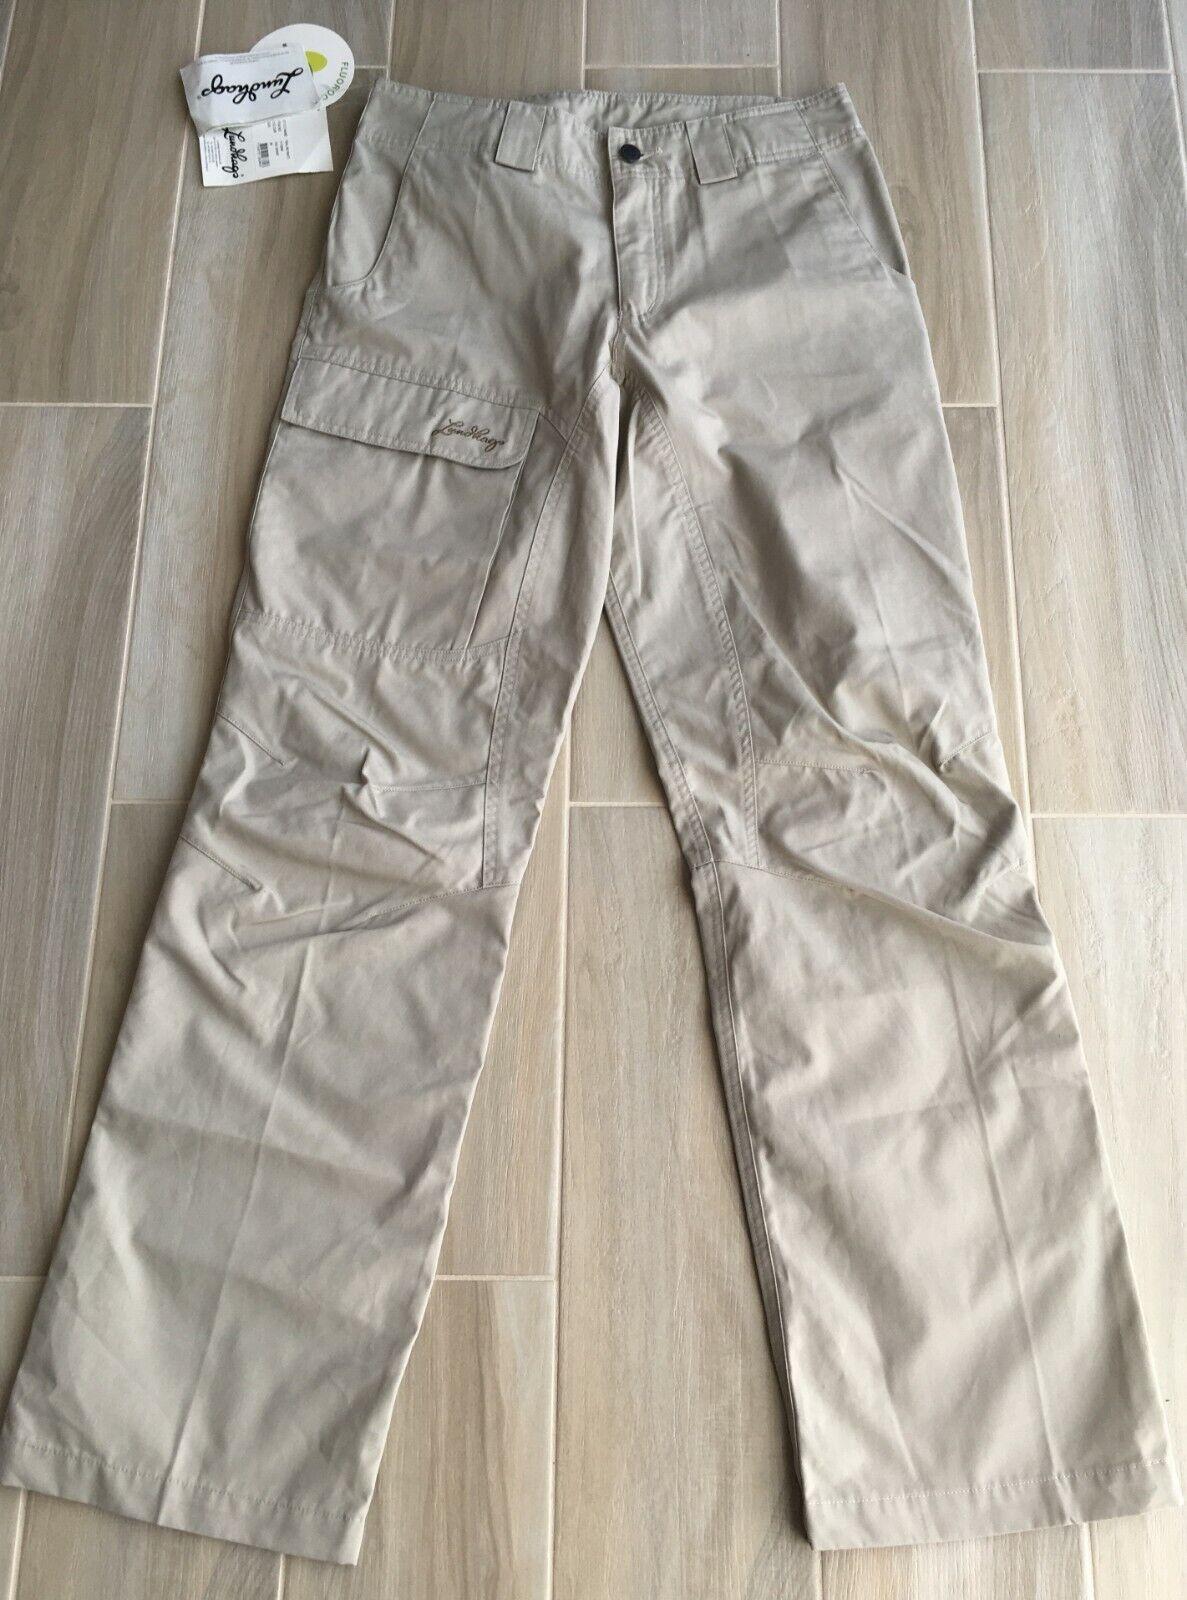 Lundhags Hiking Pants Trekking Trousers Women Size 36